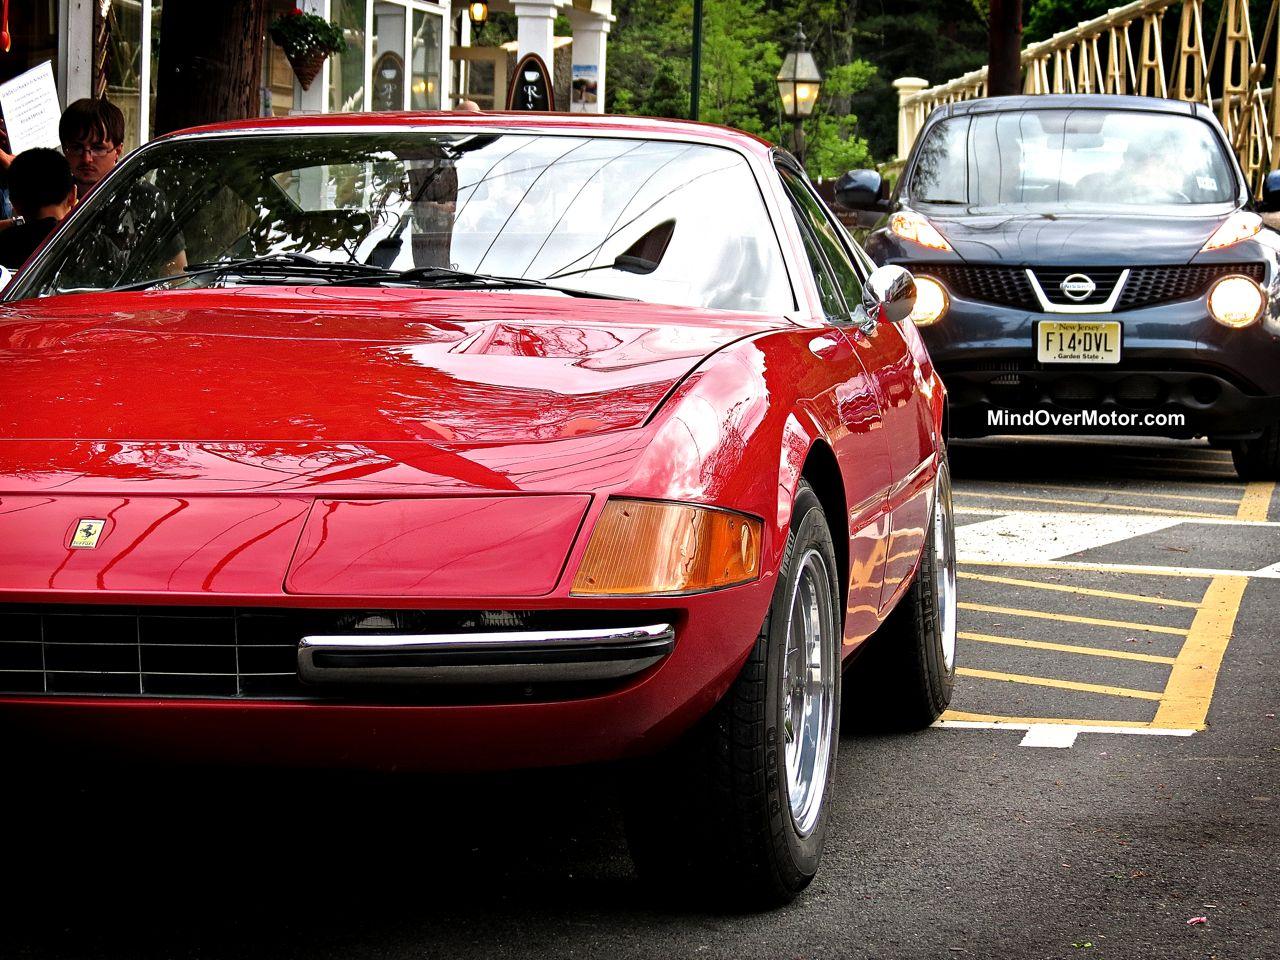 Ferrari 365 Daytona at Ladies and Lamborghinis